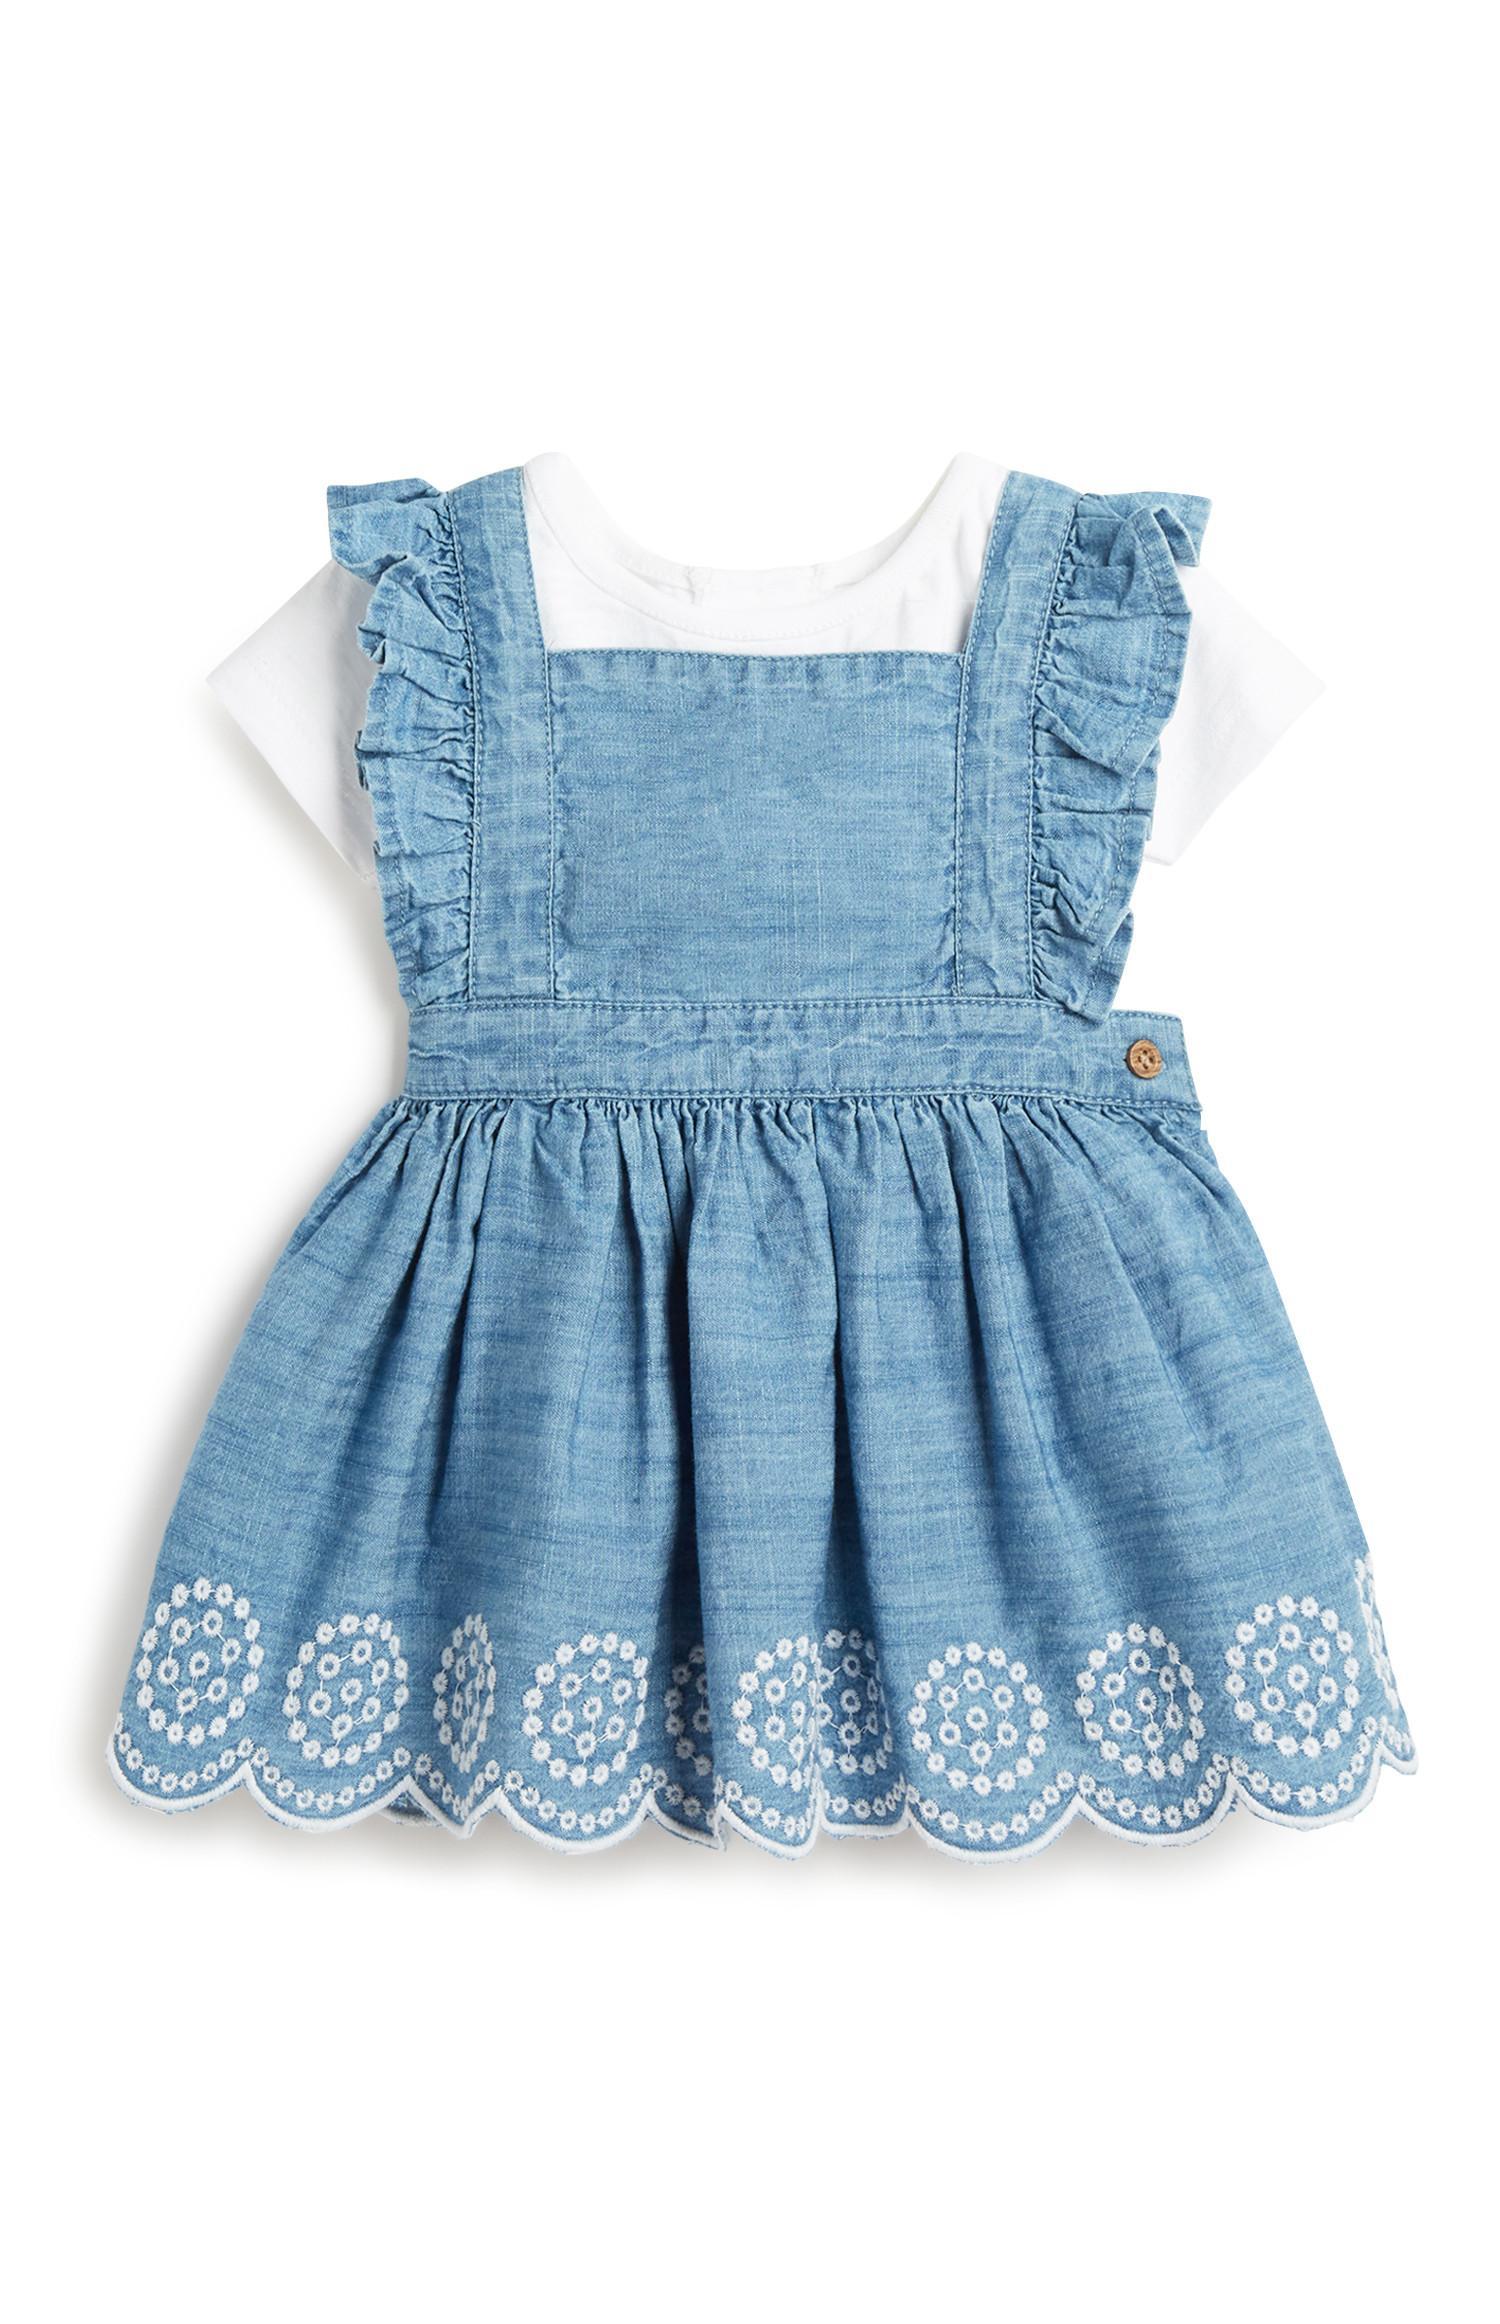 Jeanskleid für Babys (M)